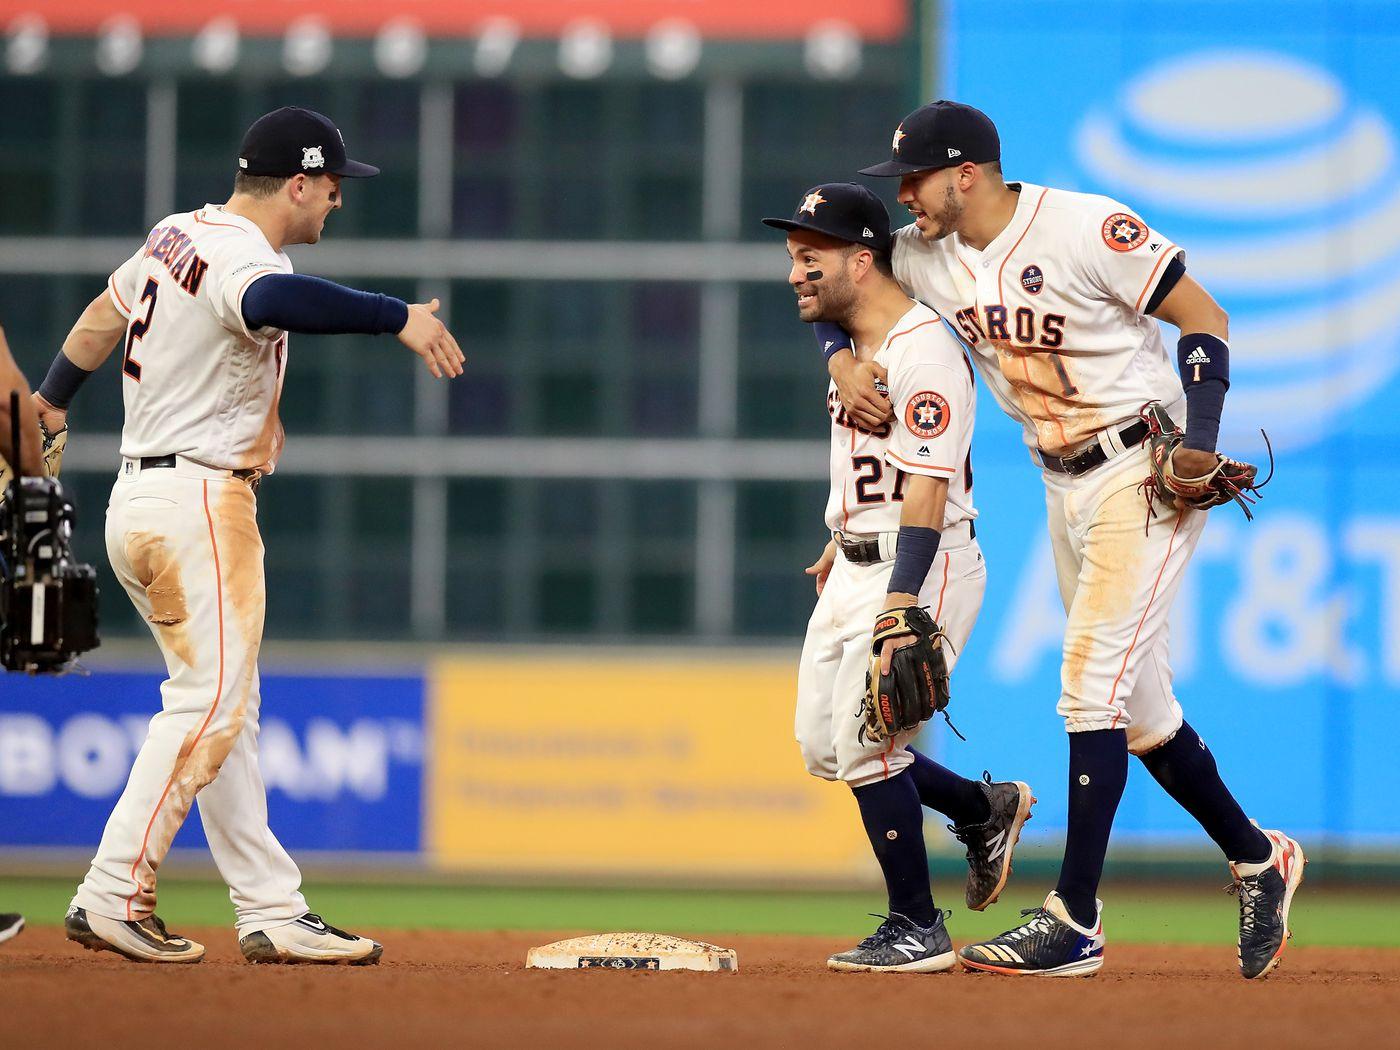 2019 AL West Preview: Houston Astros, position player